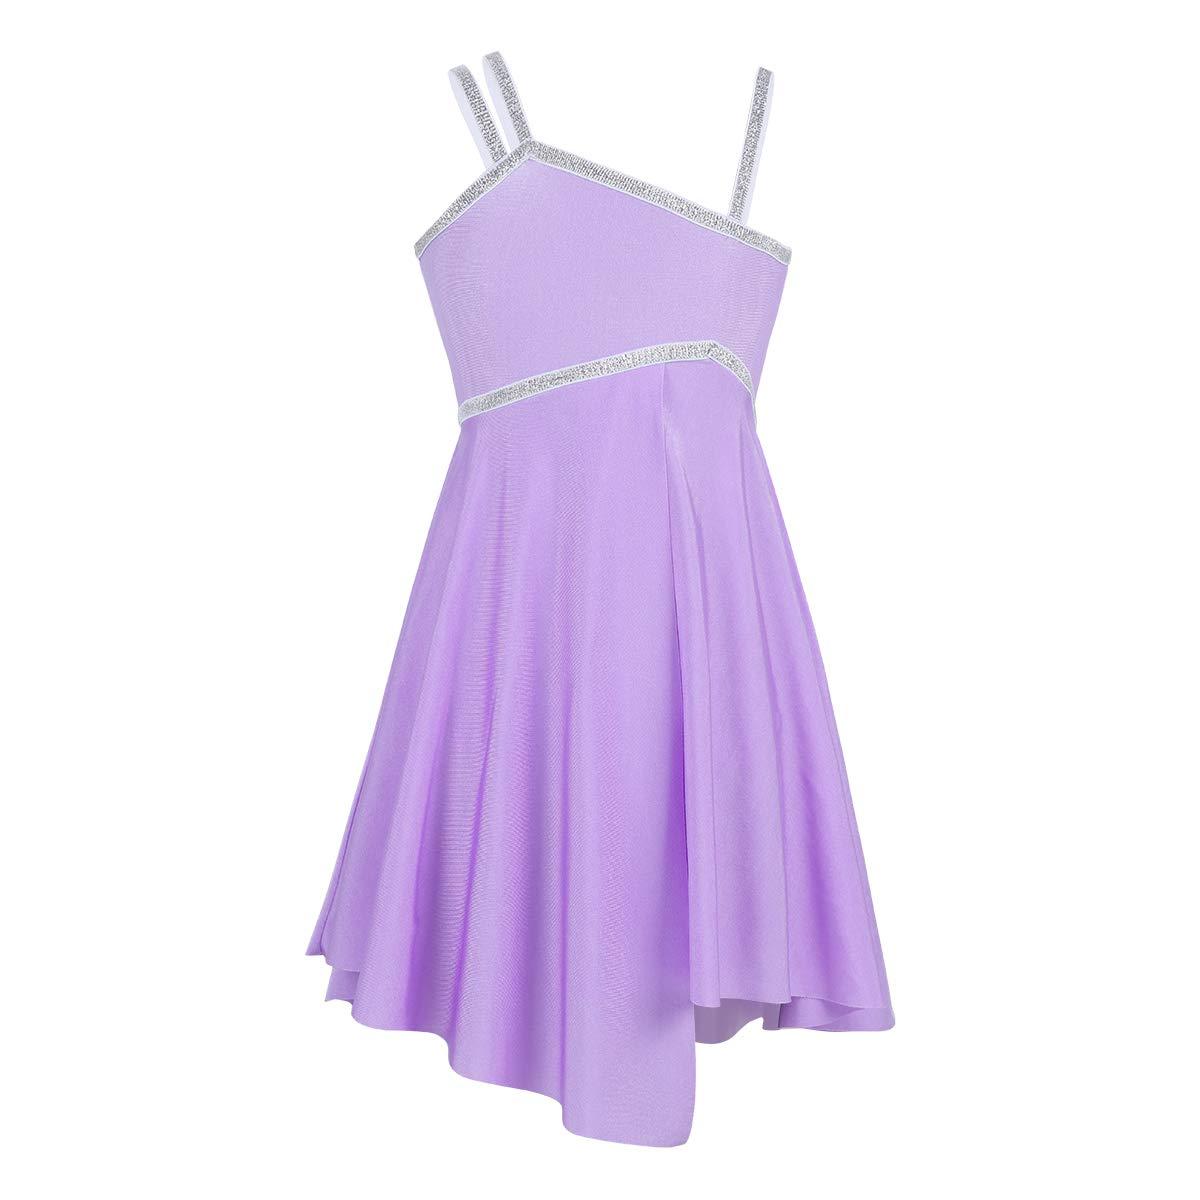 a4cee9f8fc40 YiZYiF Girl's Kids Ballerina Sequined Camisole Lyrical Dress Asymmetric Leotard  Skirt Dancing Costumes